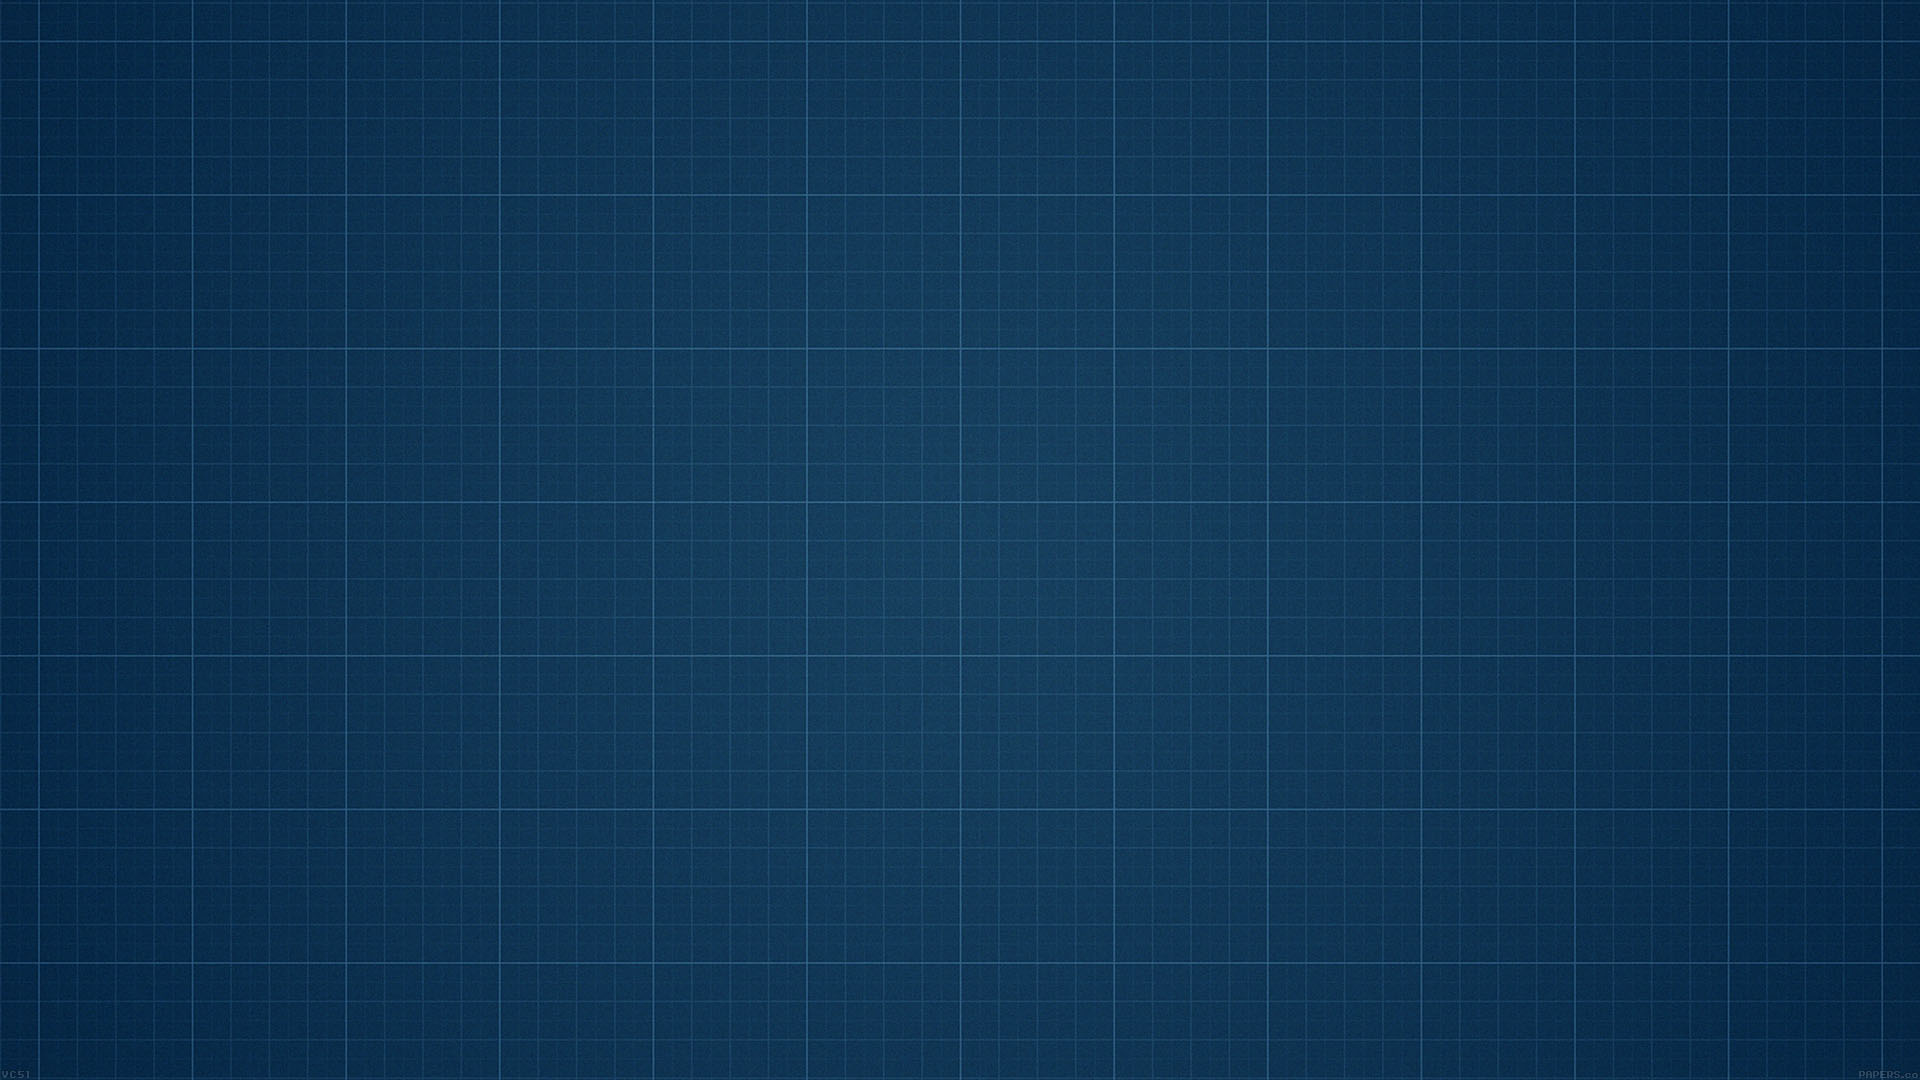 Wallpaper For Iphone X App Wallpaper For Desktop Laptop Vc51 Blueprint Technical